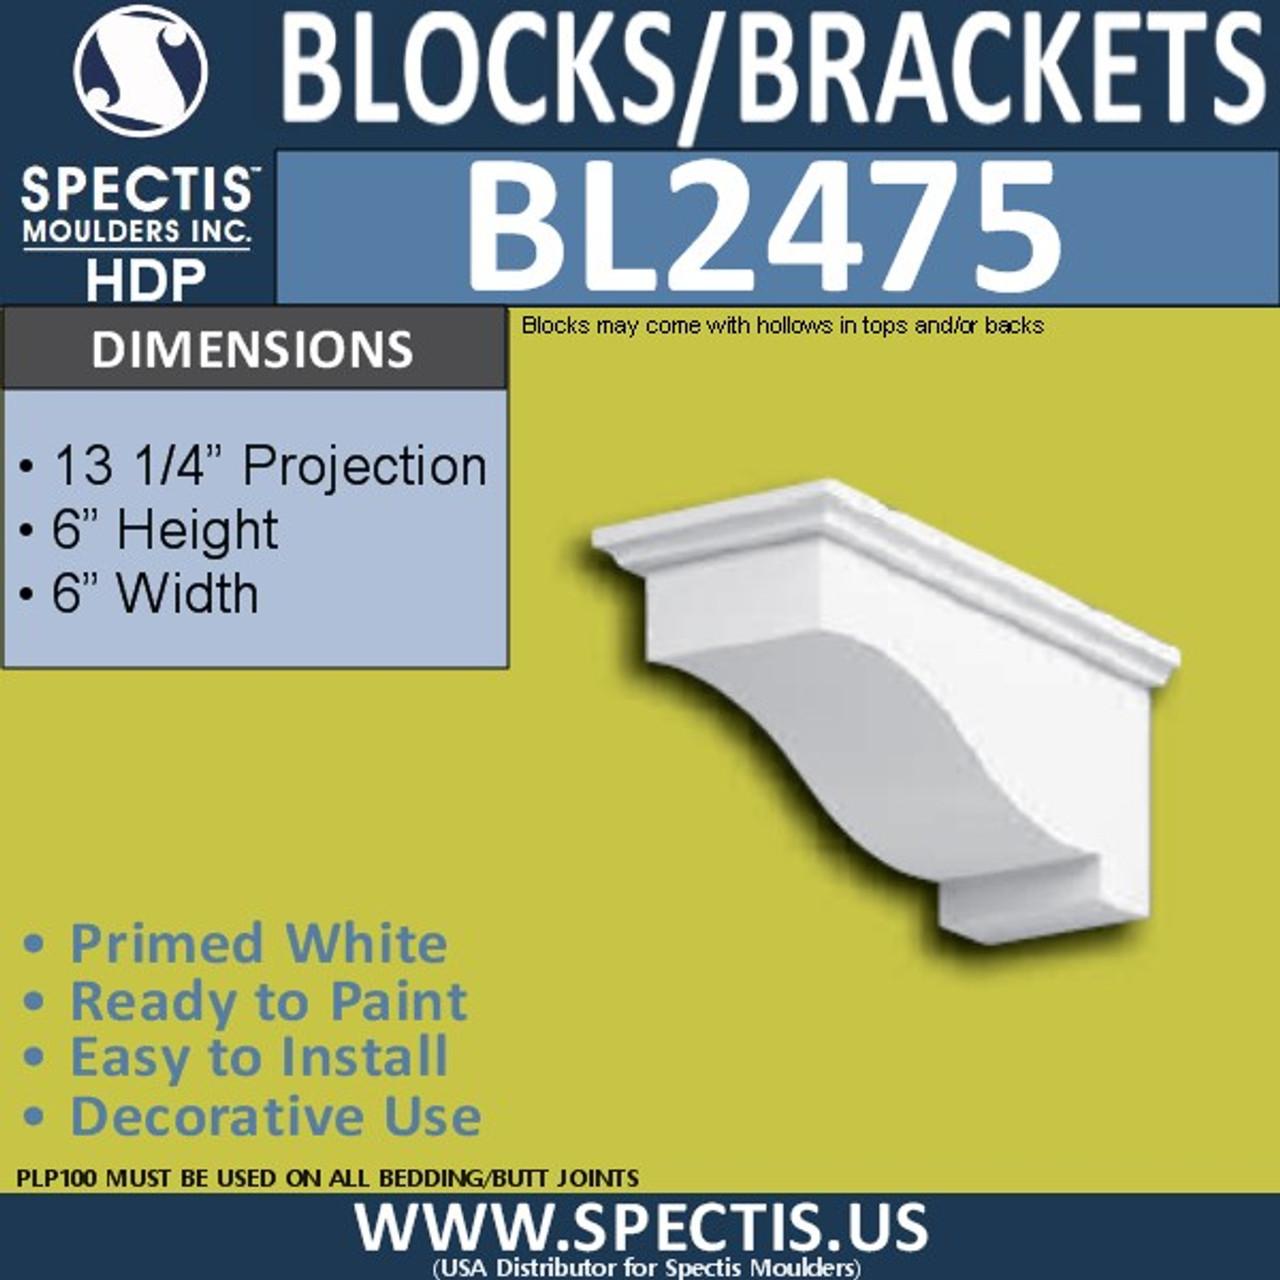 "BL2475 Eave Block or Bracket 6""W x 6""H x 13.25"" P"